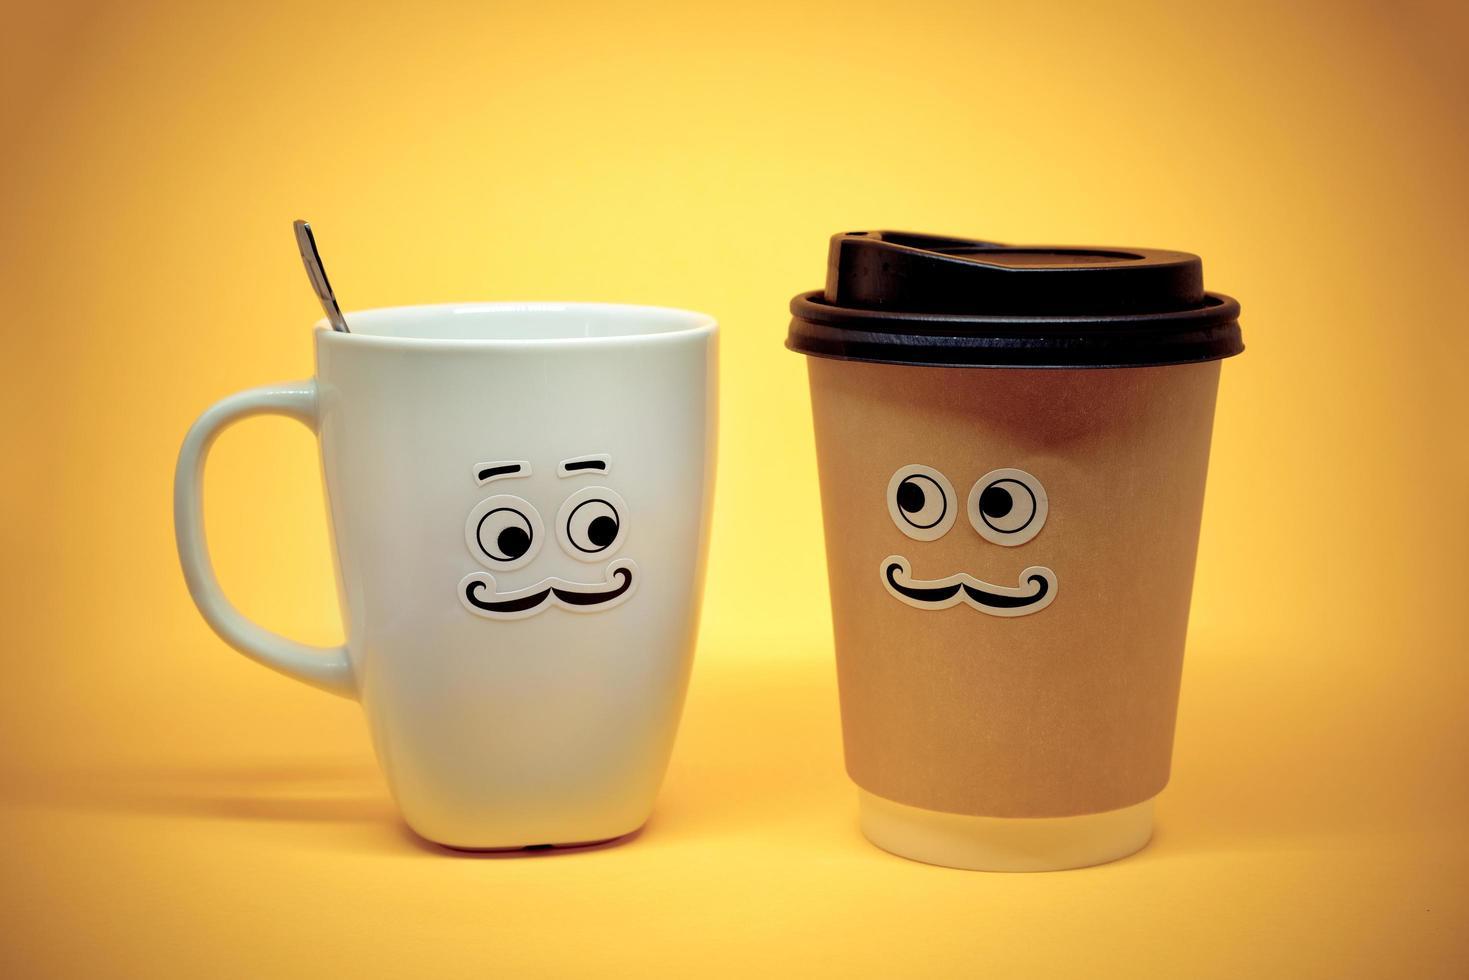 smiley kaffekoppar på gul bakgrund foto